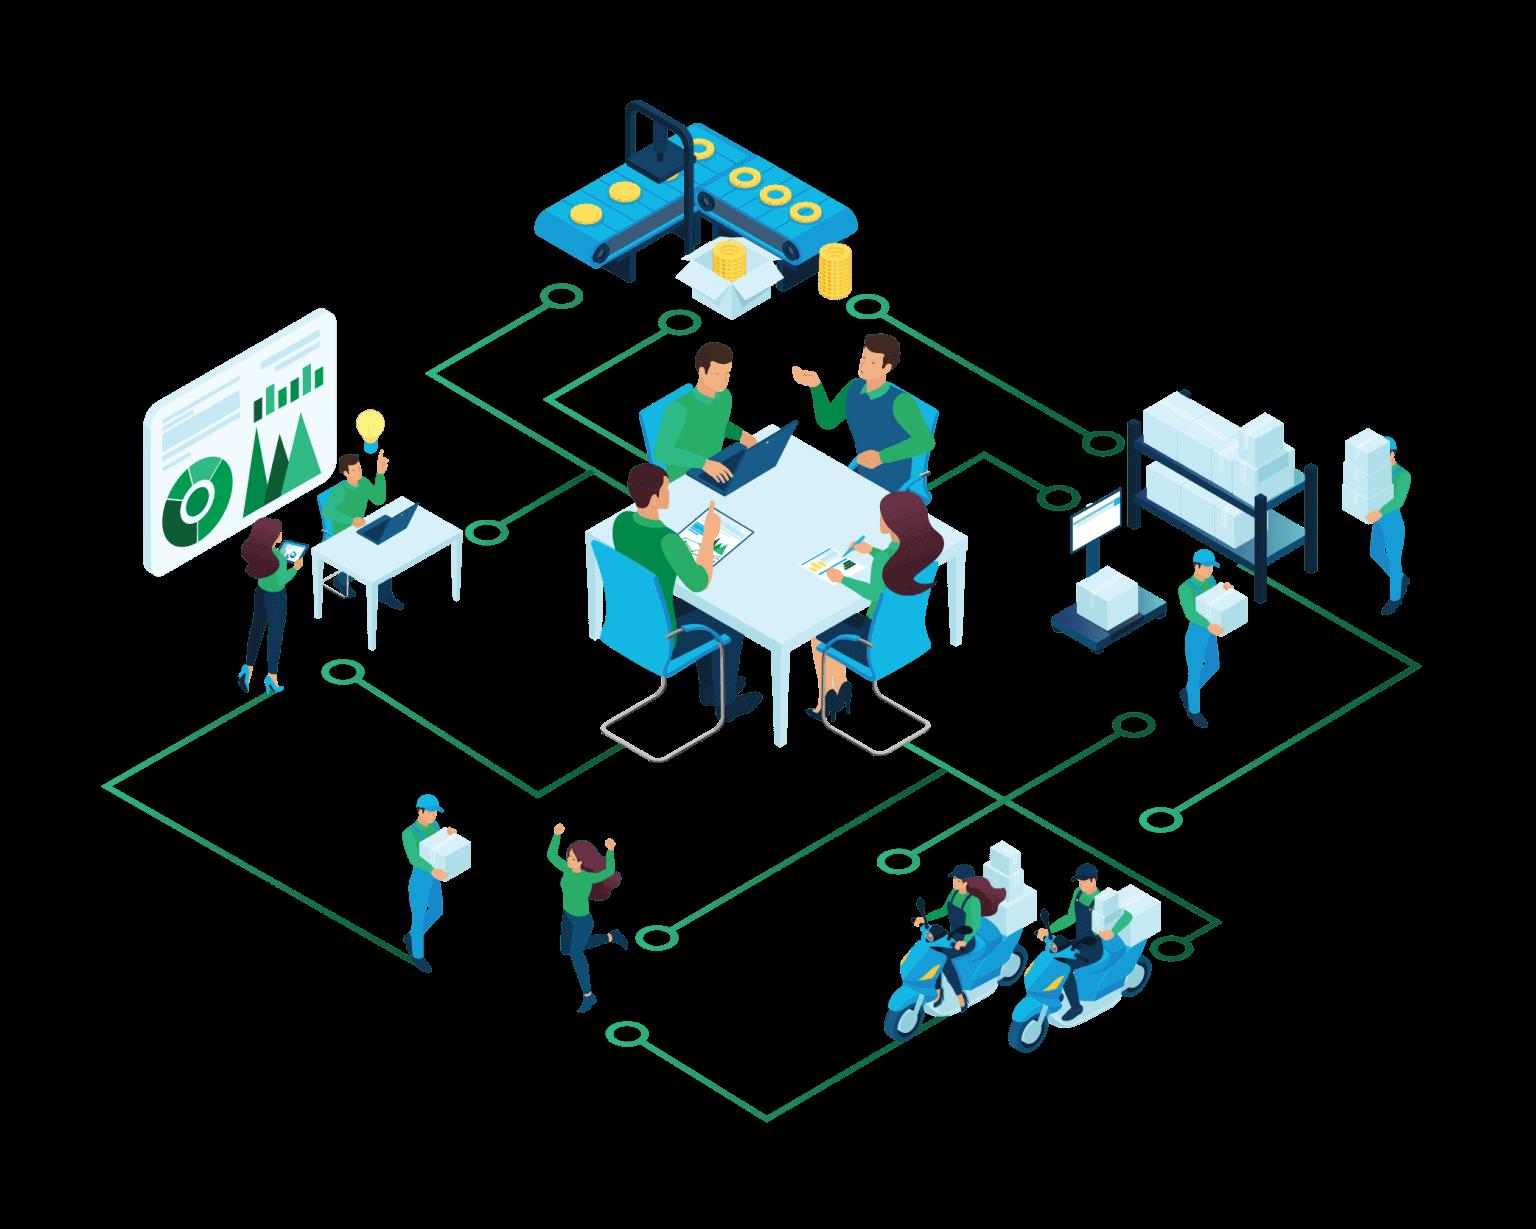 Business process management software - web based collaboration platform